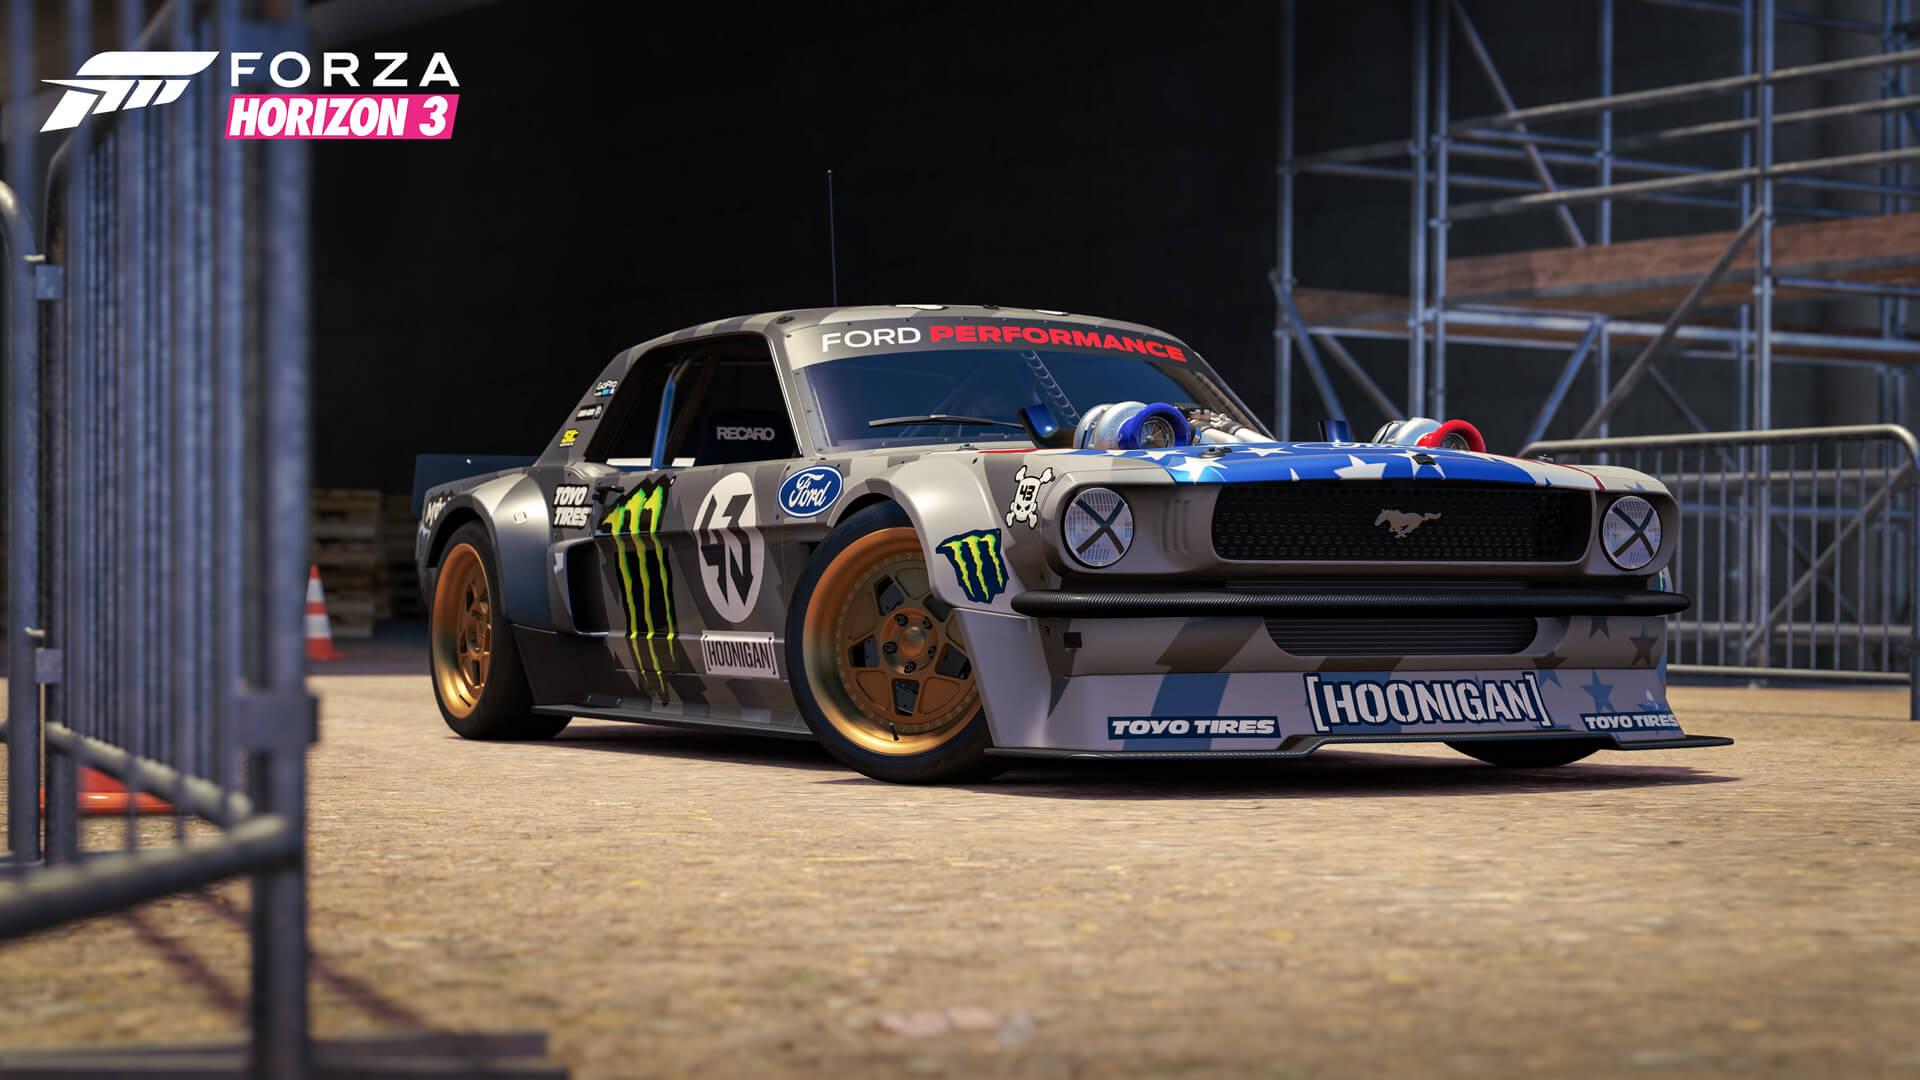 Forza 7 s Pre Order Bonus is Free Forza Horizon 3 Has New